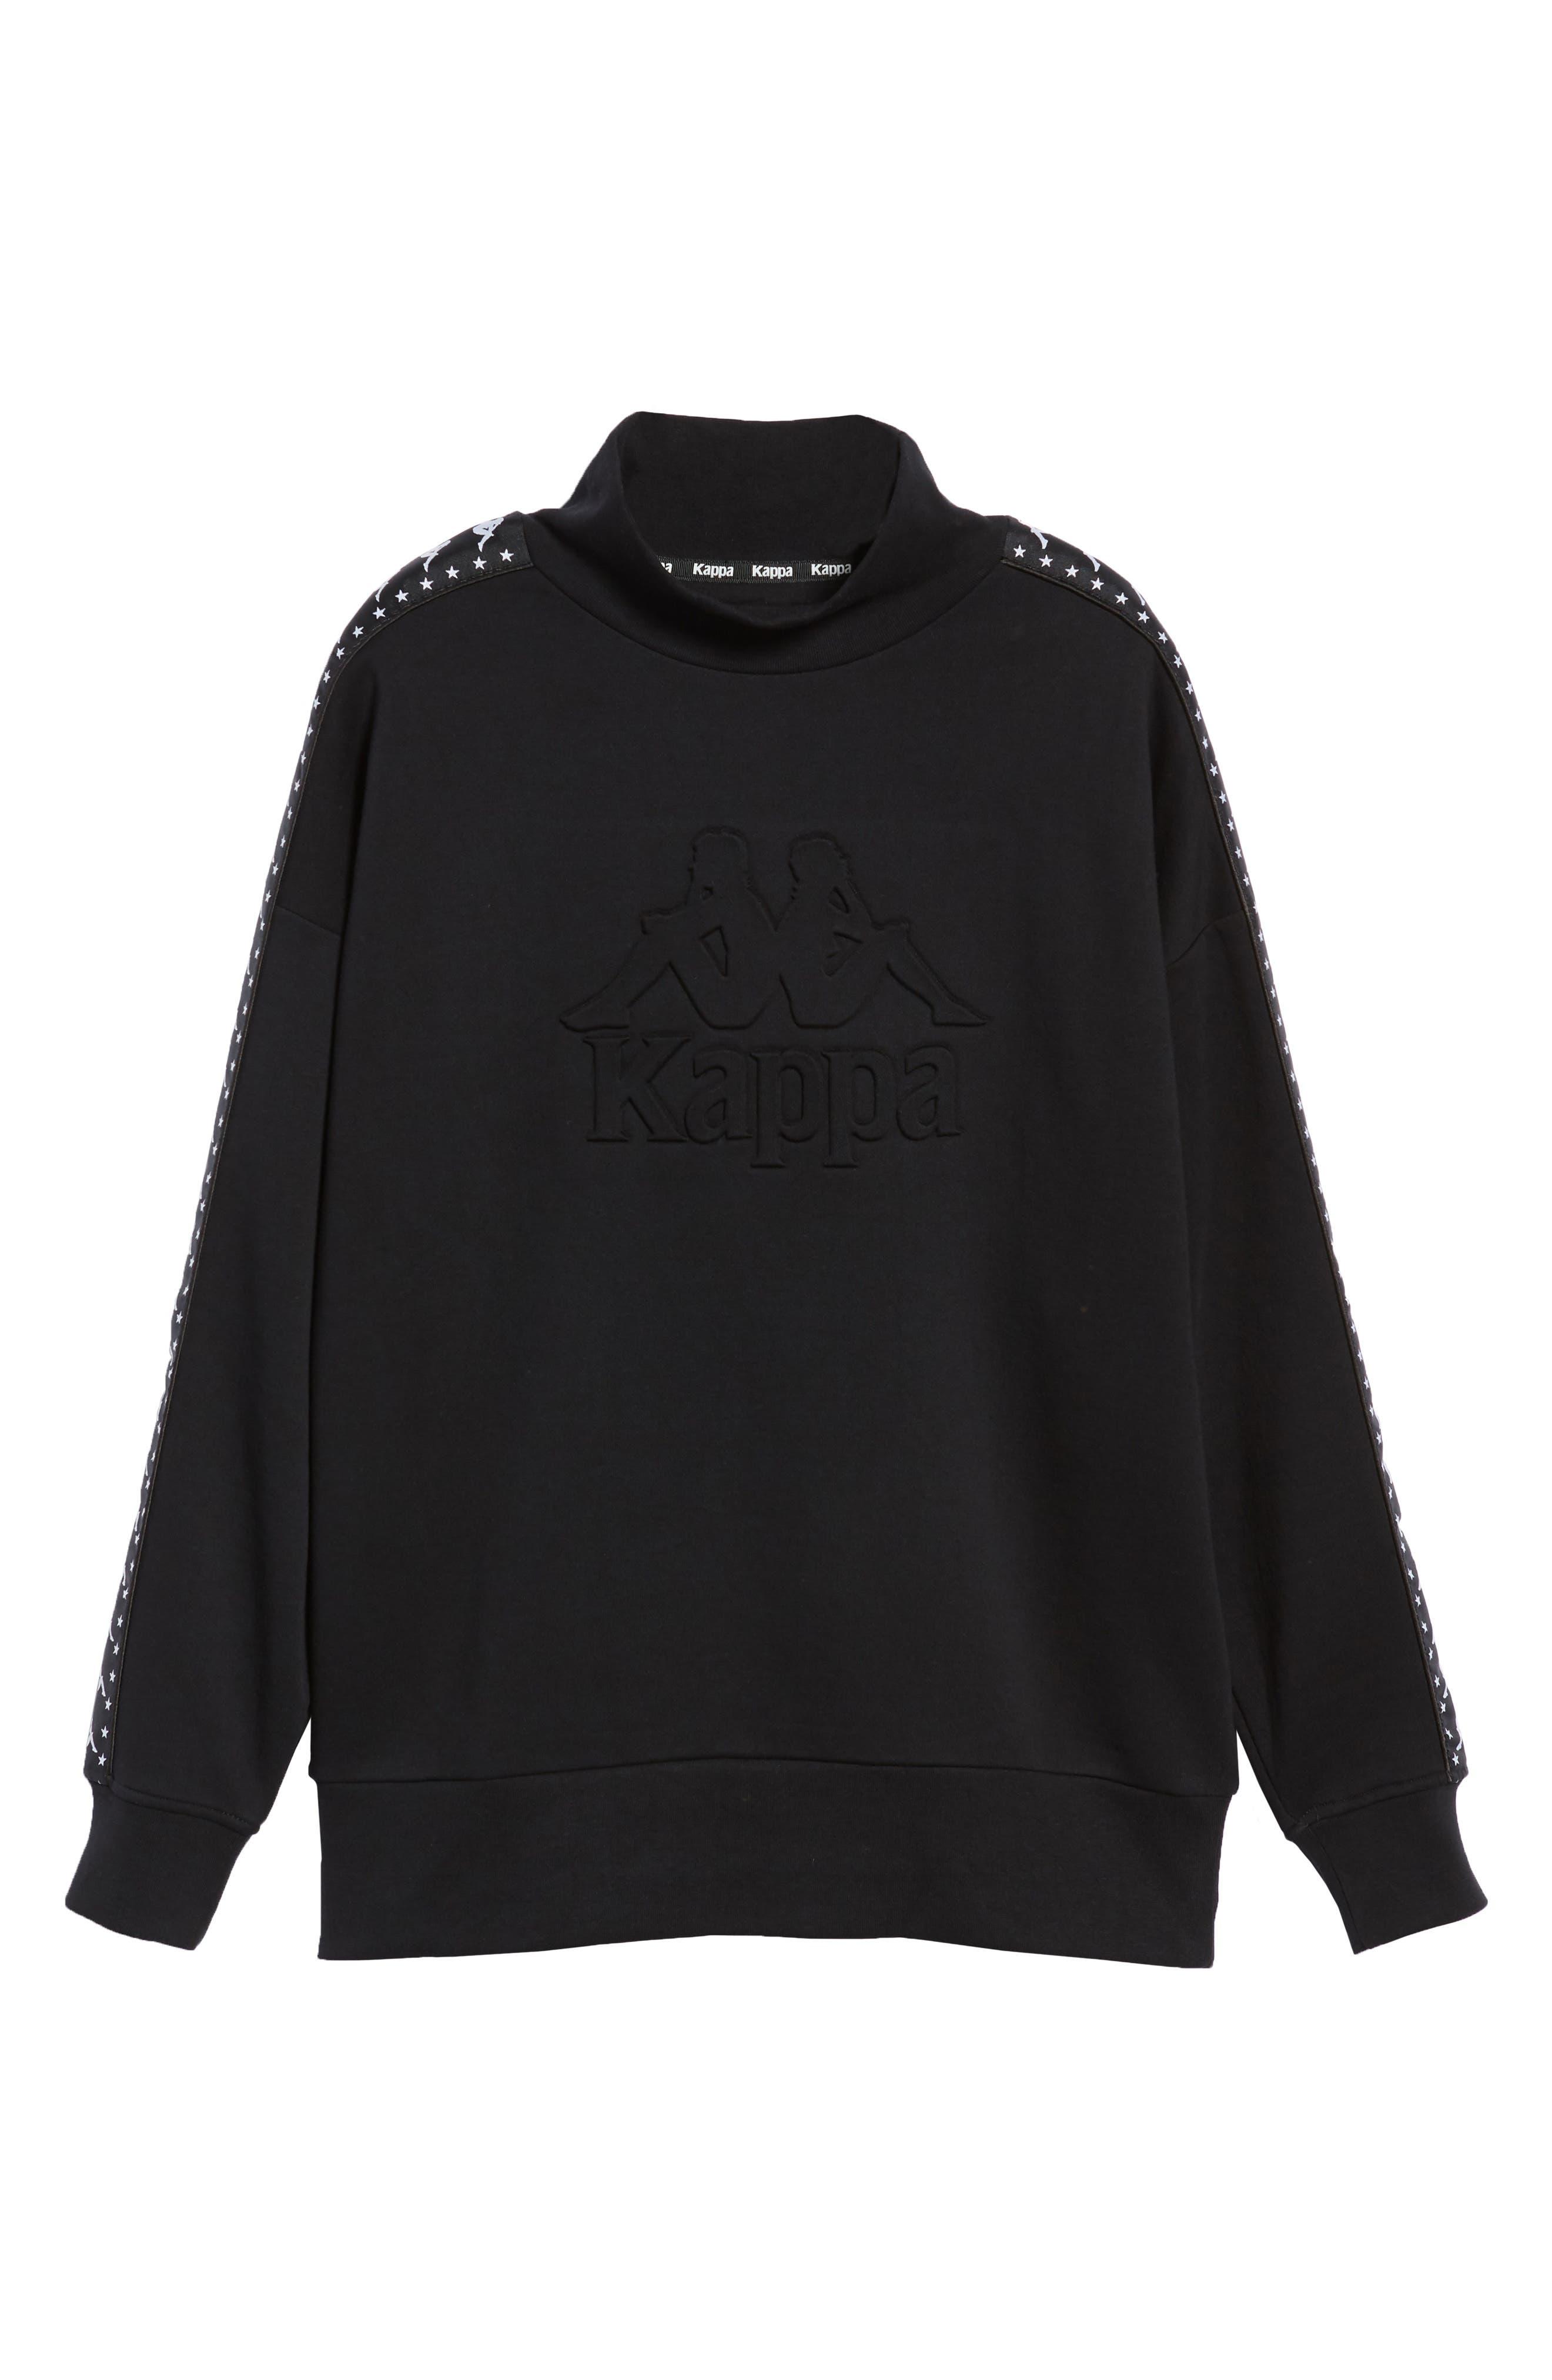 Authentic Alef Mock Neck Sweatshirt,                             Alternate thumbnail 6, color,                             BLACK/ WHITE